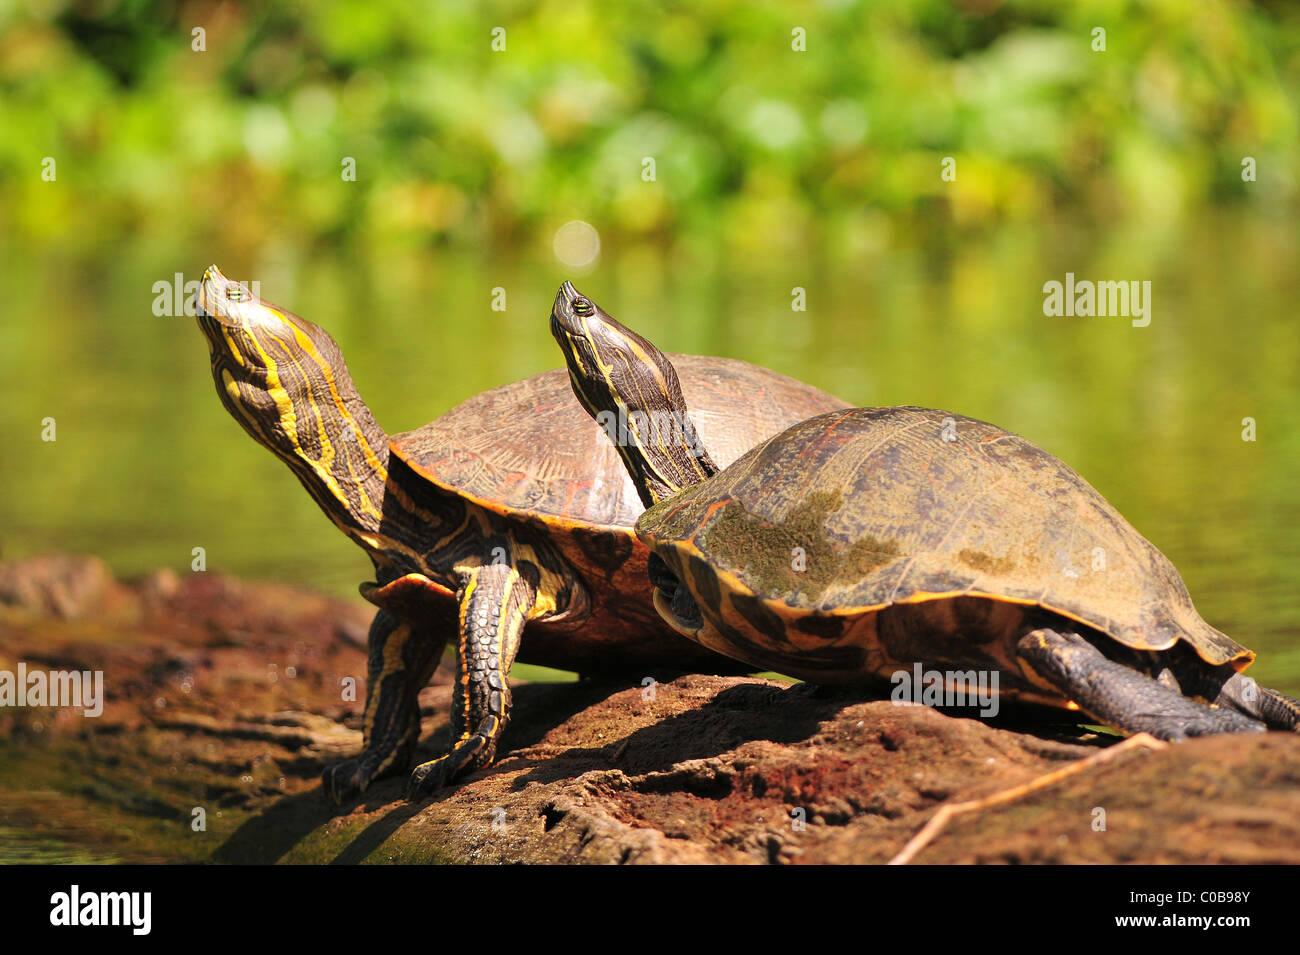 River Turtles in Tortugureo National Park Costa Rica 2011 - Stock Image